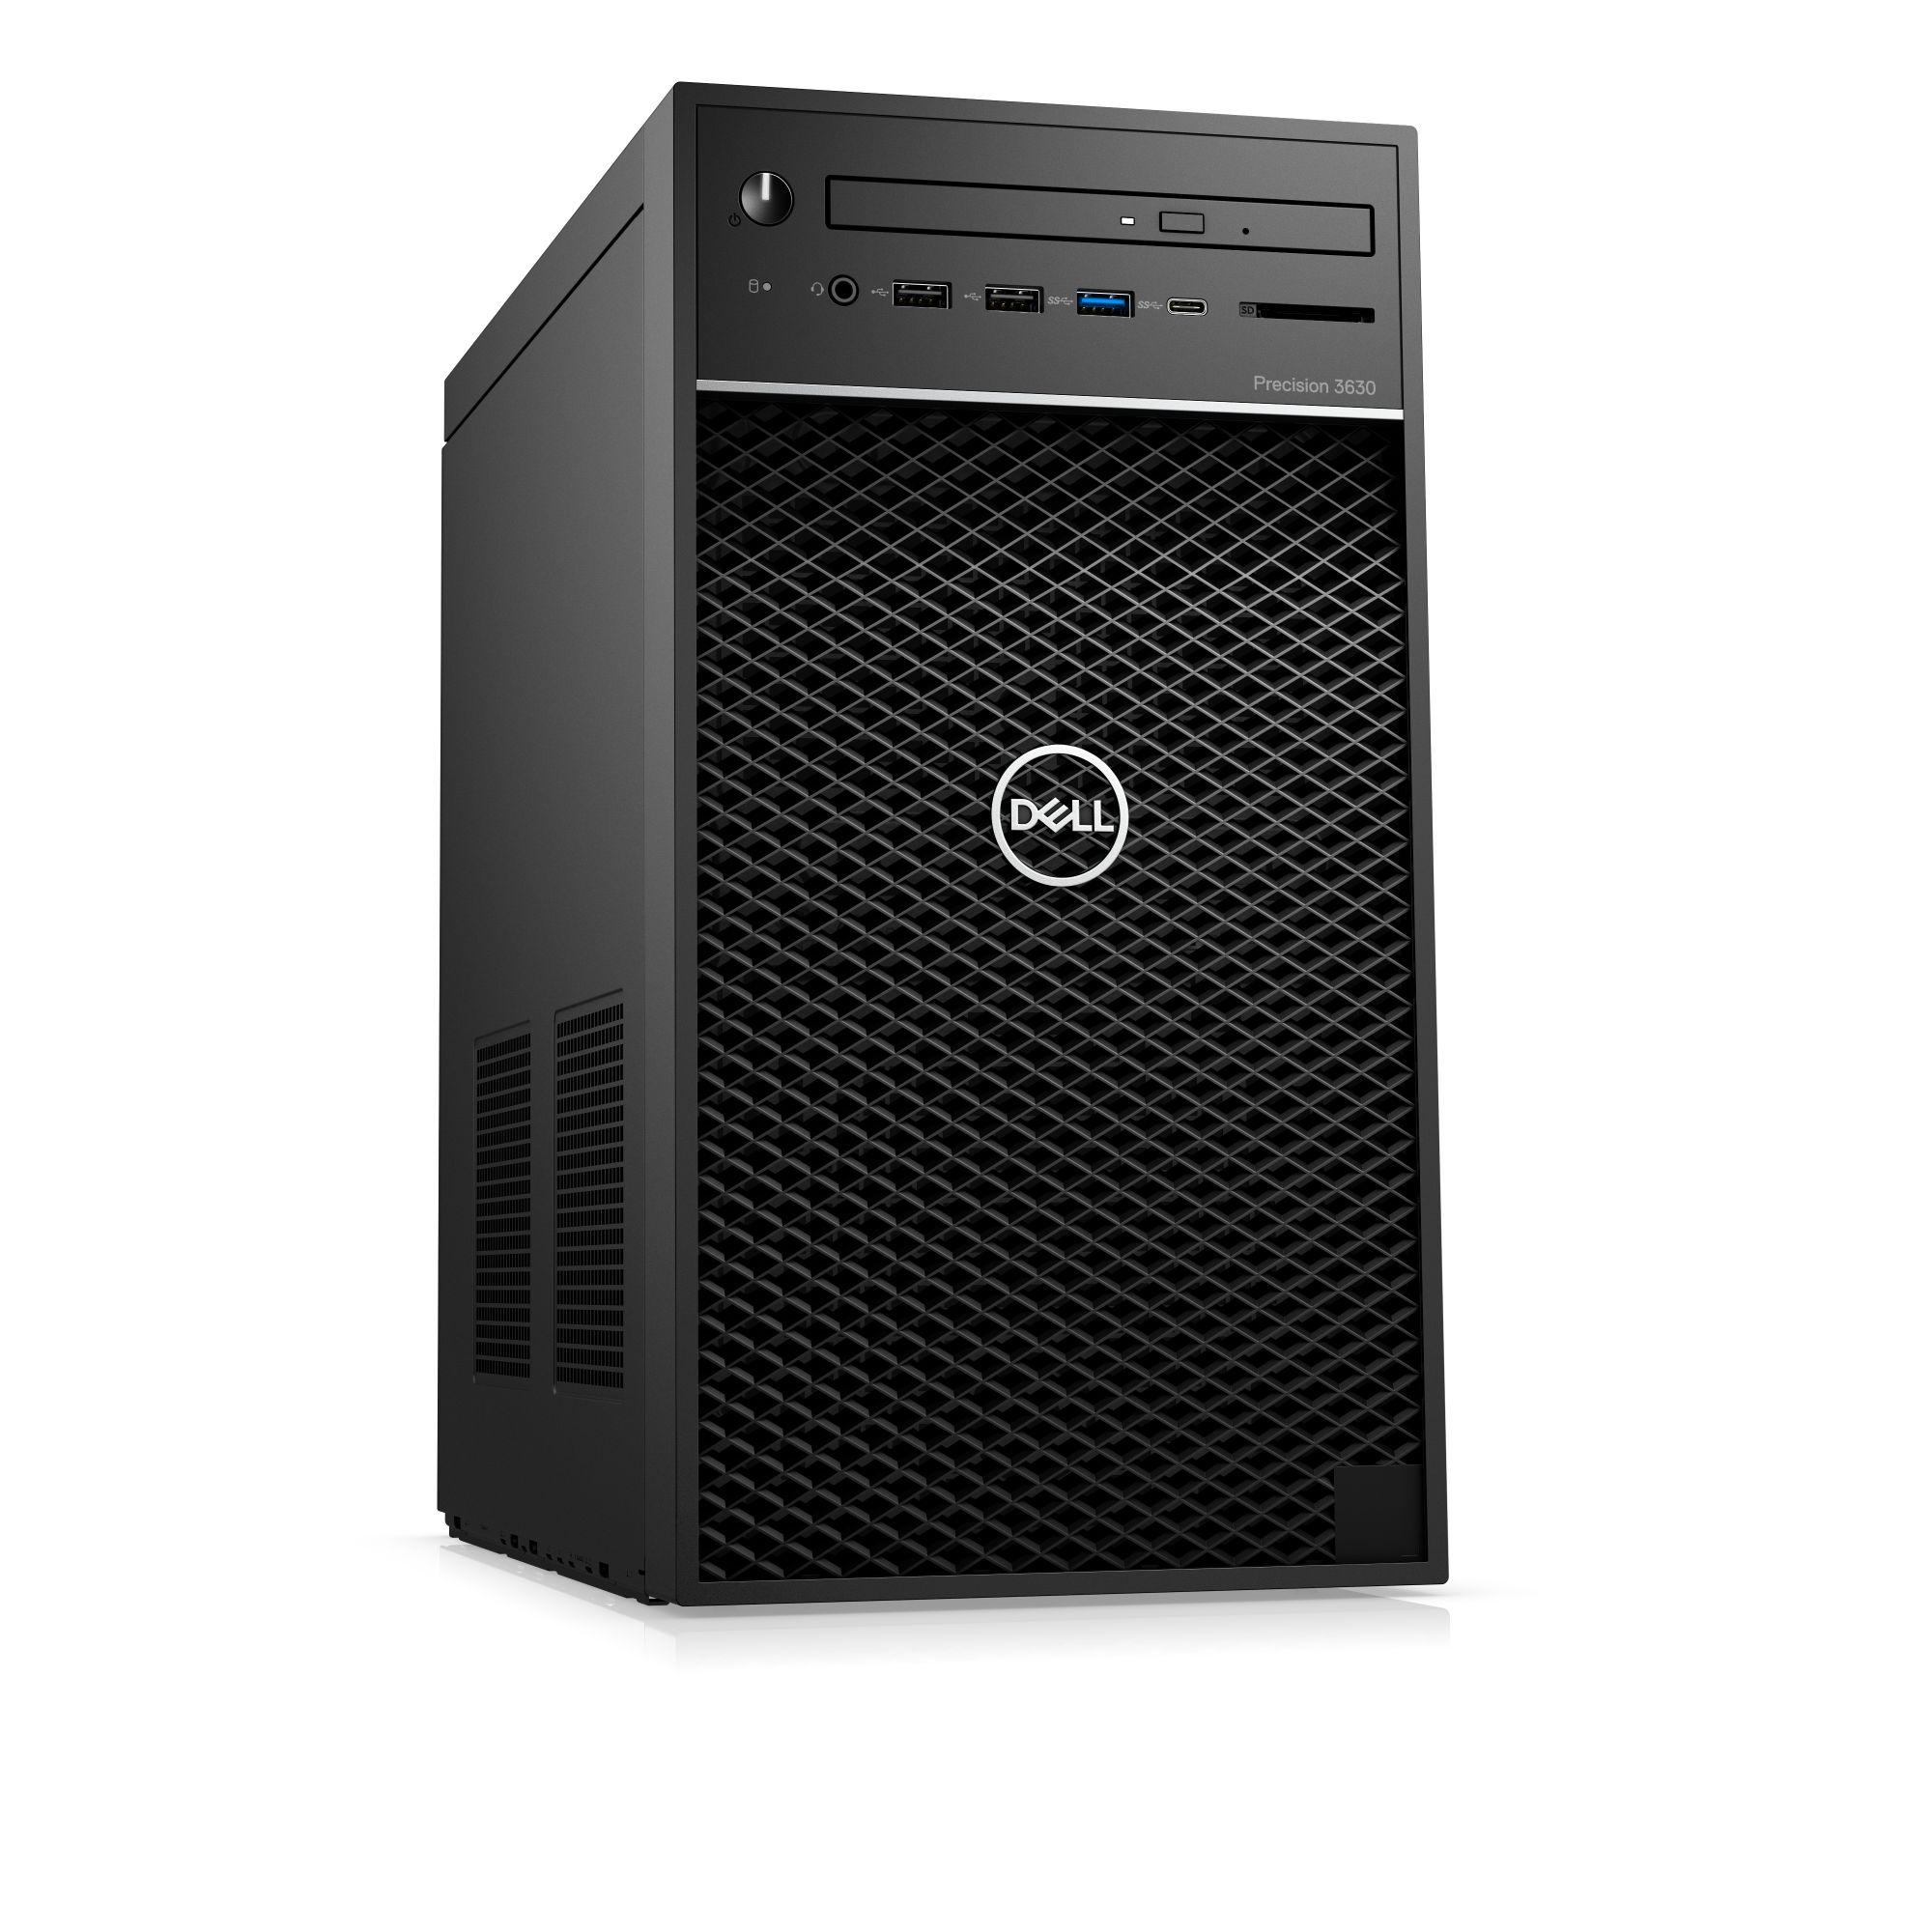 Dell Precision T3630 i7-8700/16GB/256GB SSD+1TB/P1000-4GB/DVD-RW/USB-C/DP/W10P/3RNBD/Černý